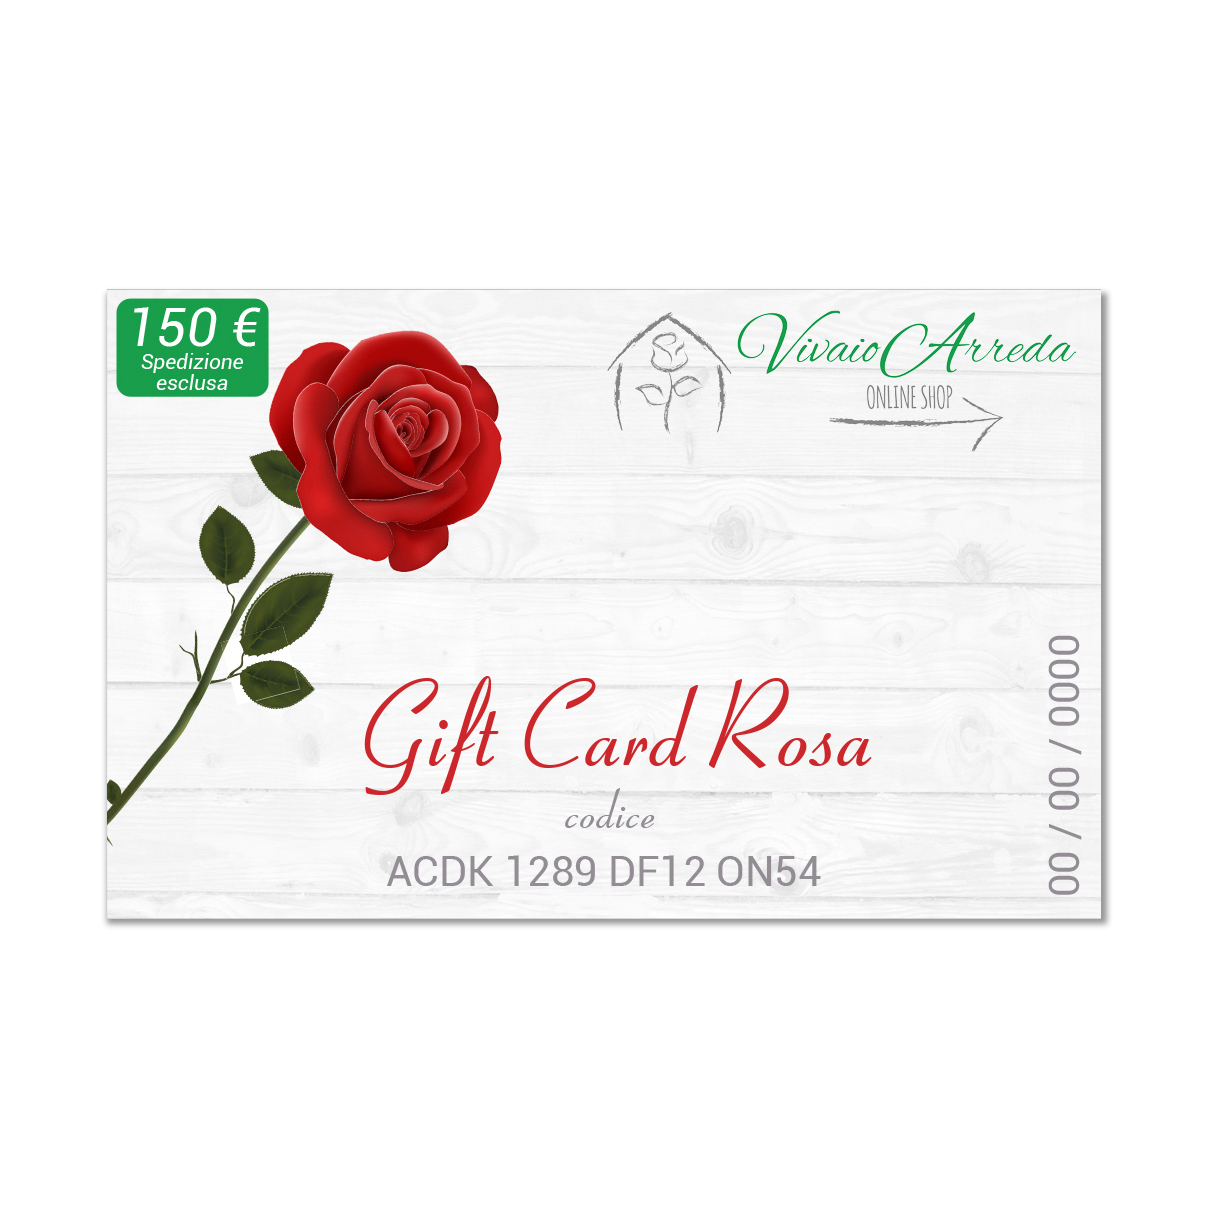 Gift Card Rosa - Vivaio Arreda Online Shop